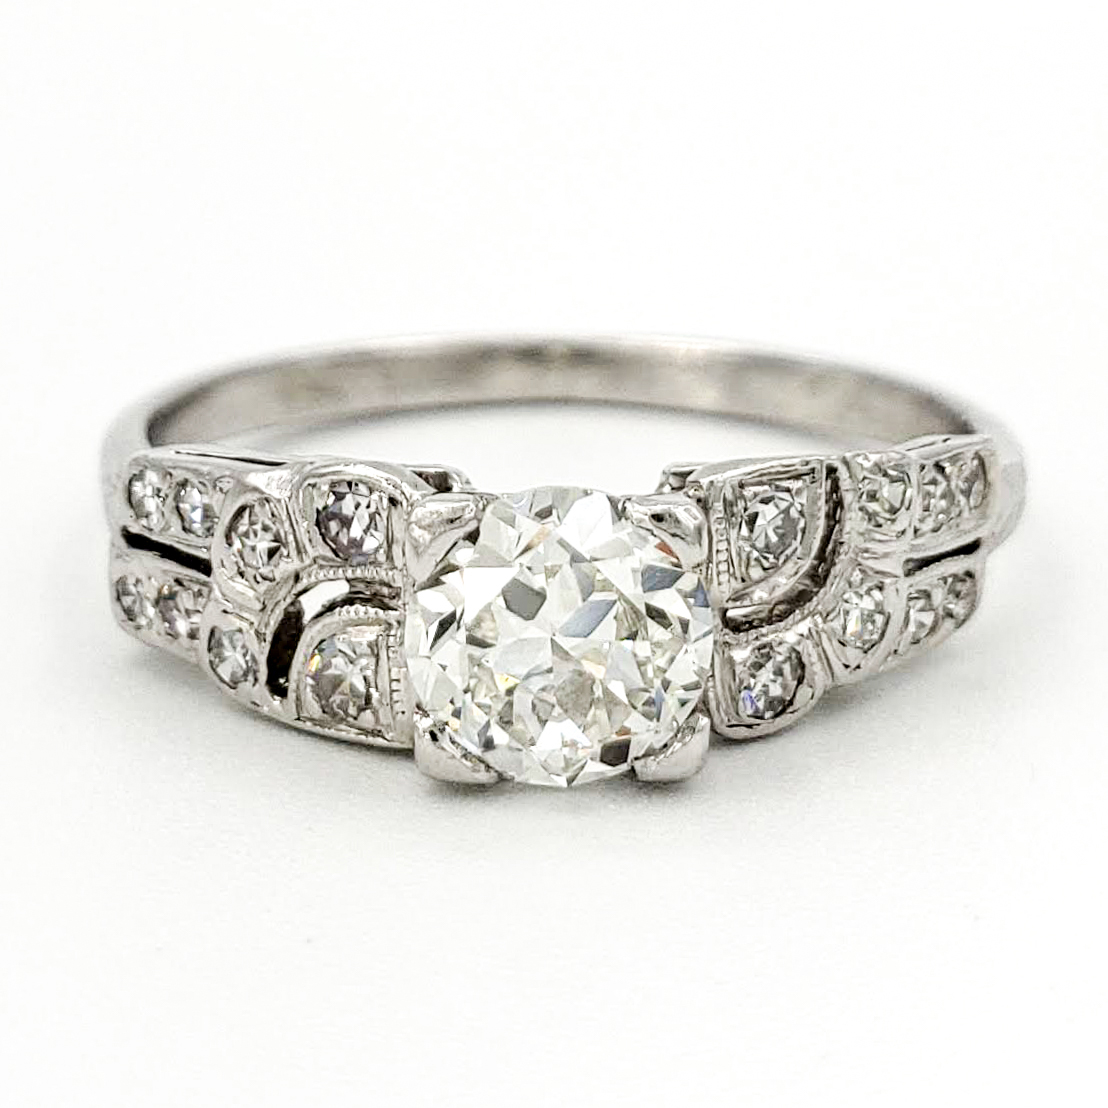 vintage-platinum-engagement-ring-with-0-59-carat-old-european-cut-diamond-egl-h-vs1